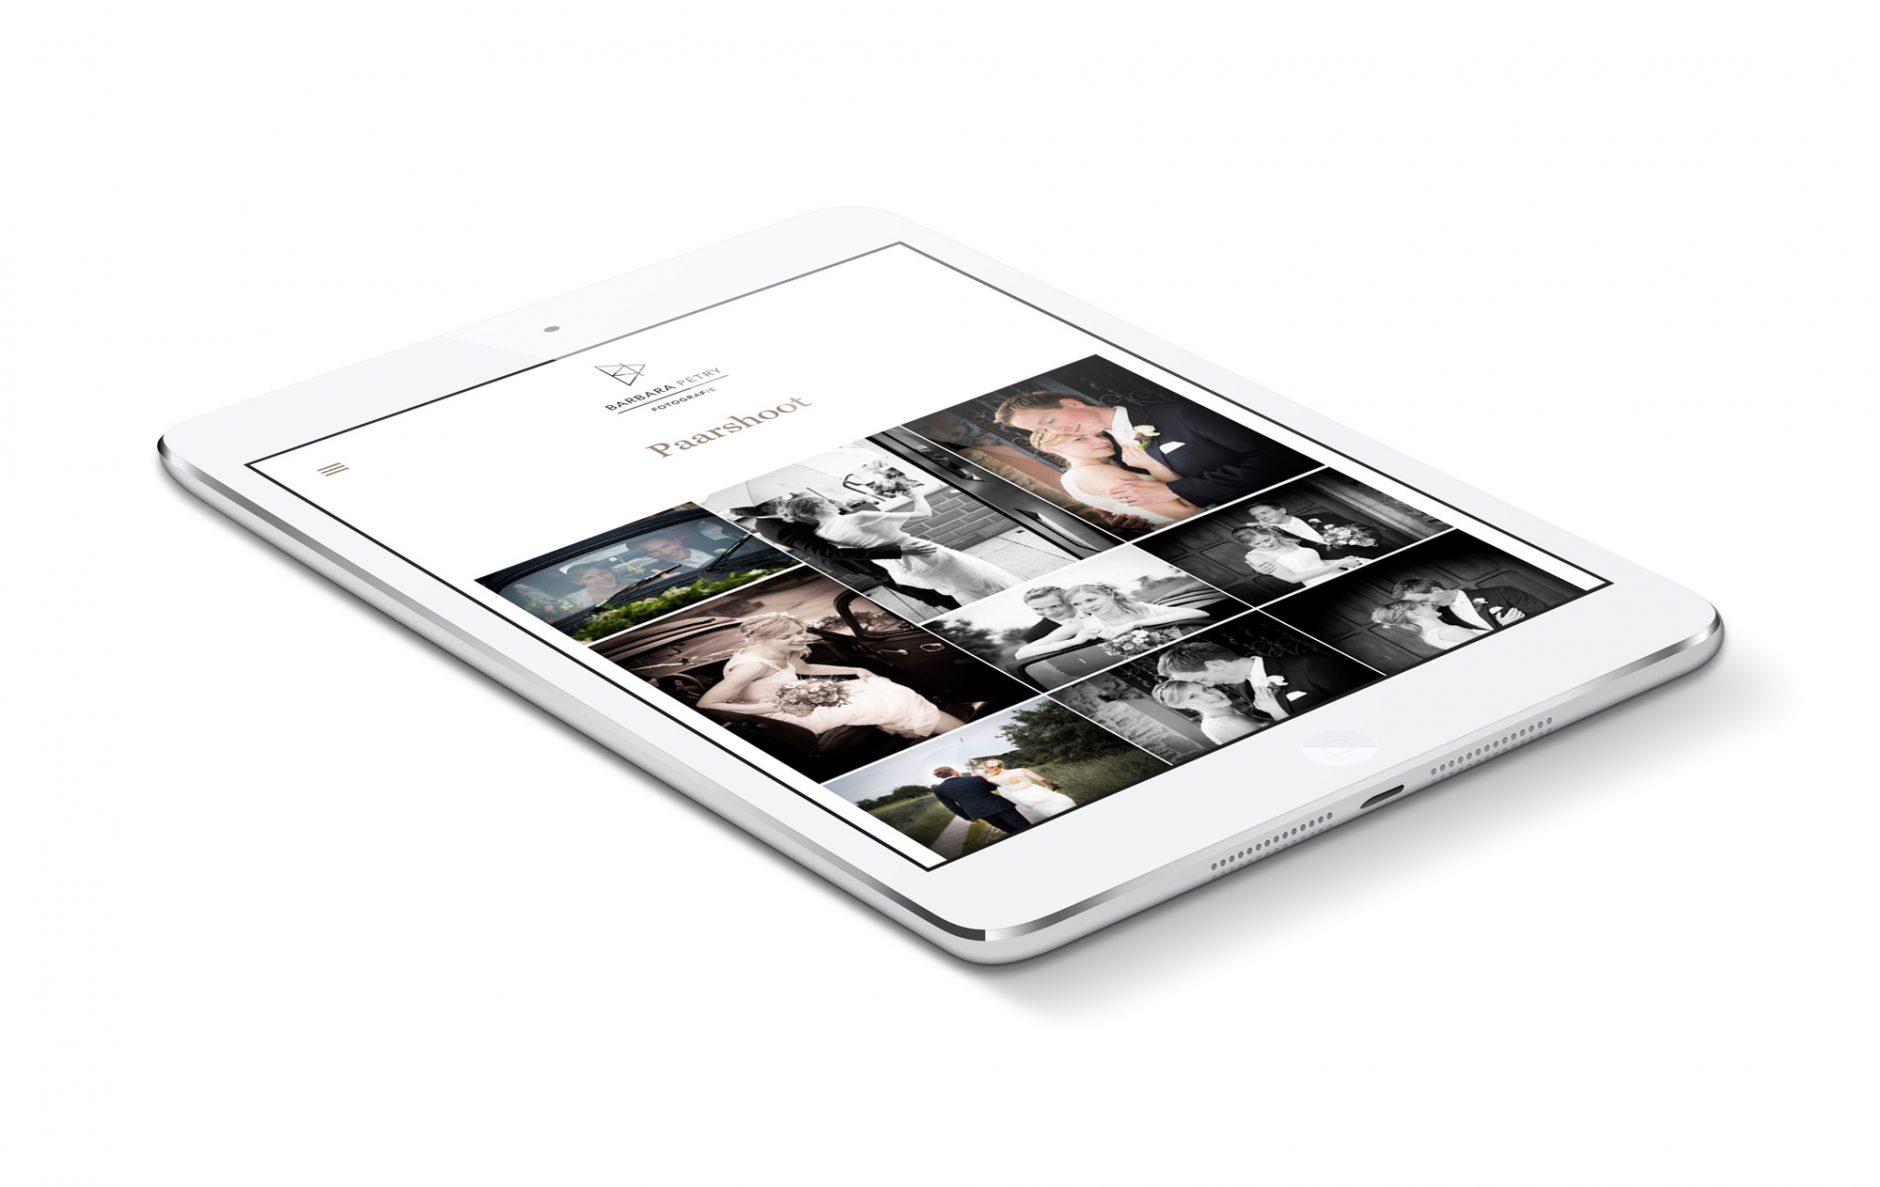 referenz_barbarapetry_tablet_02